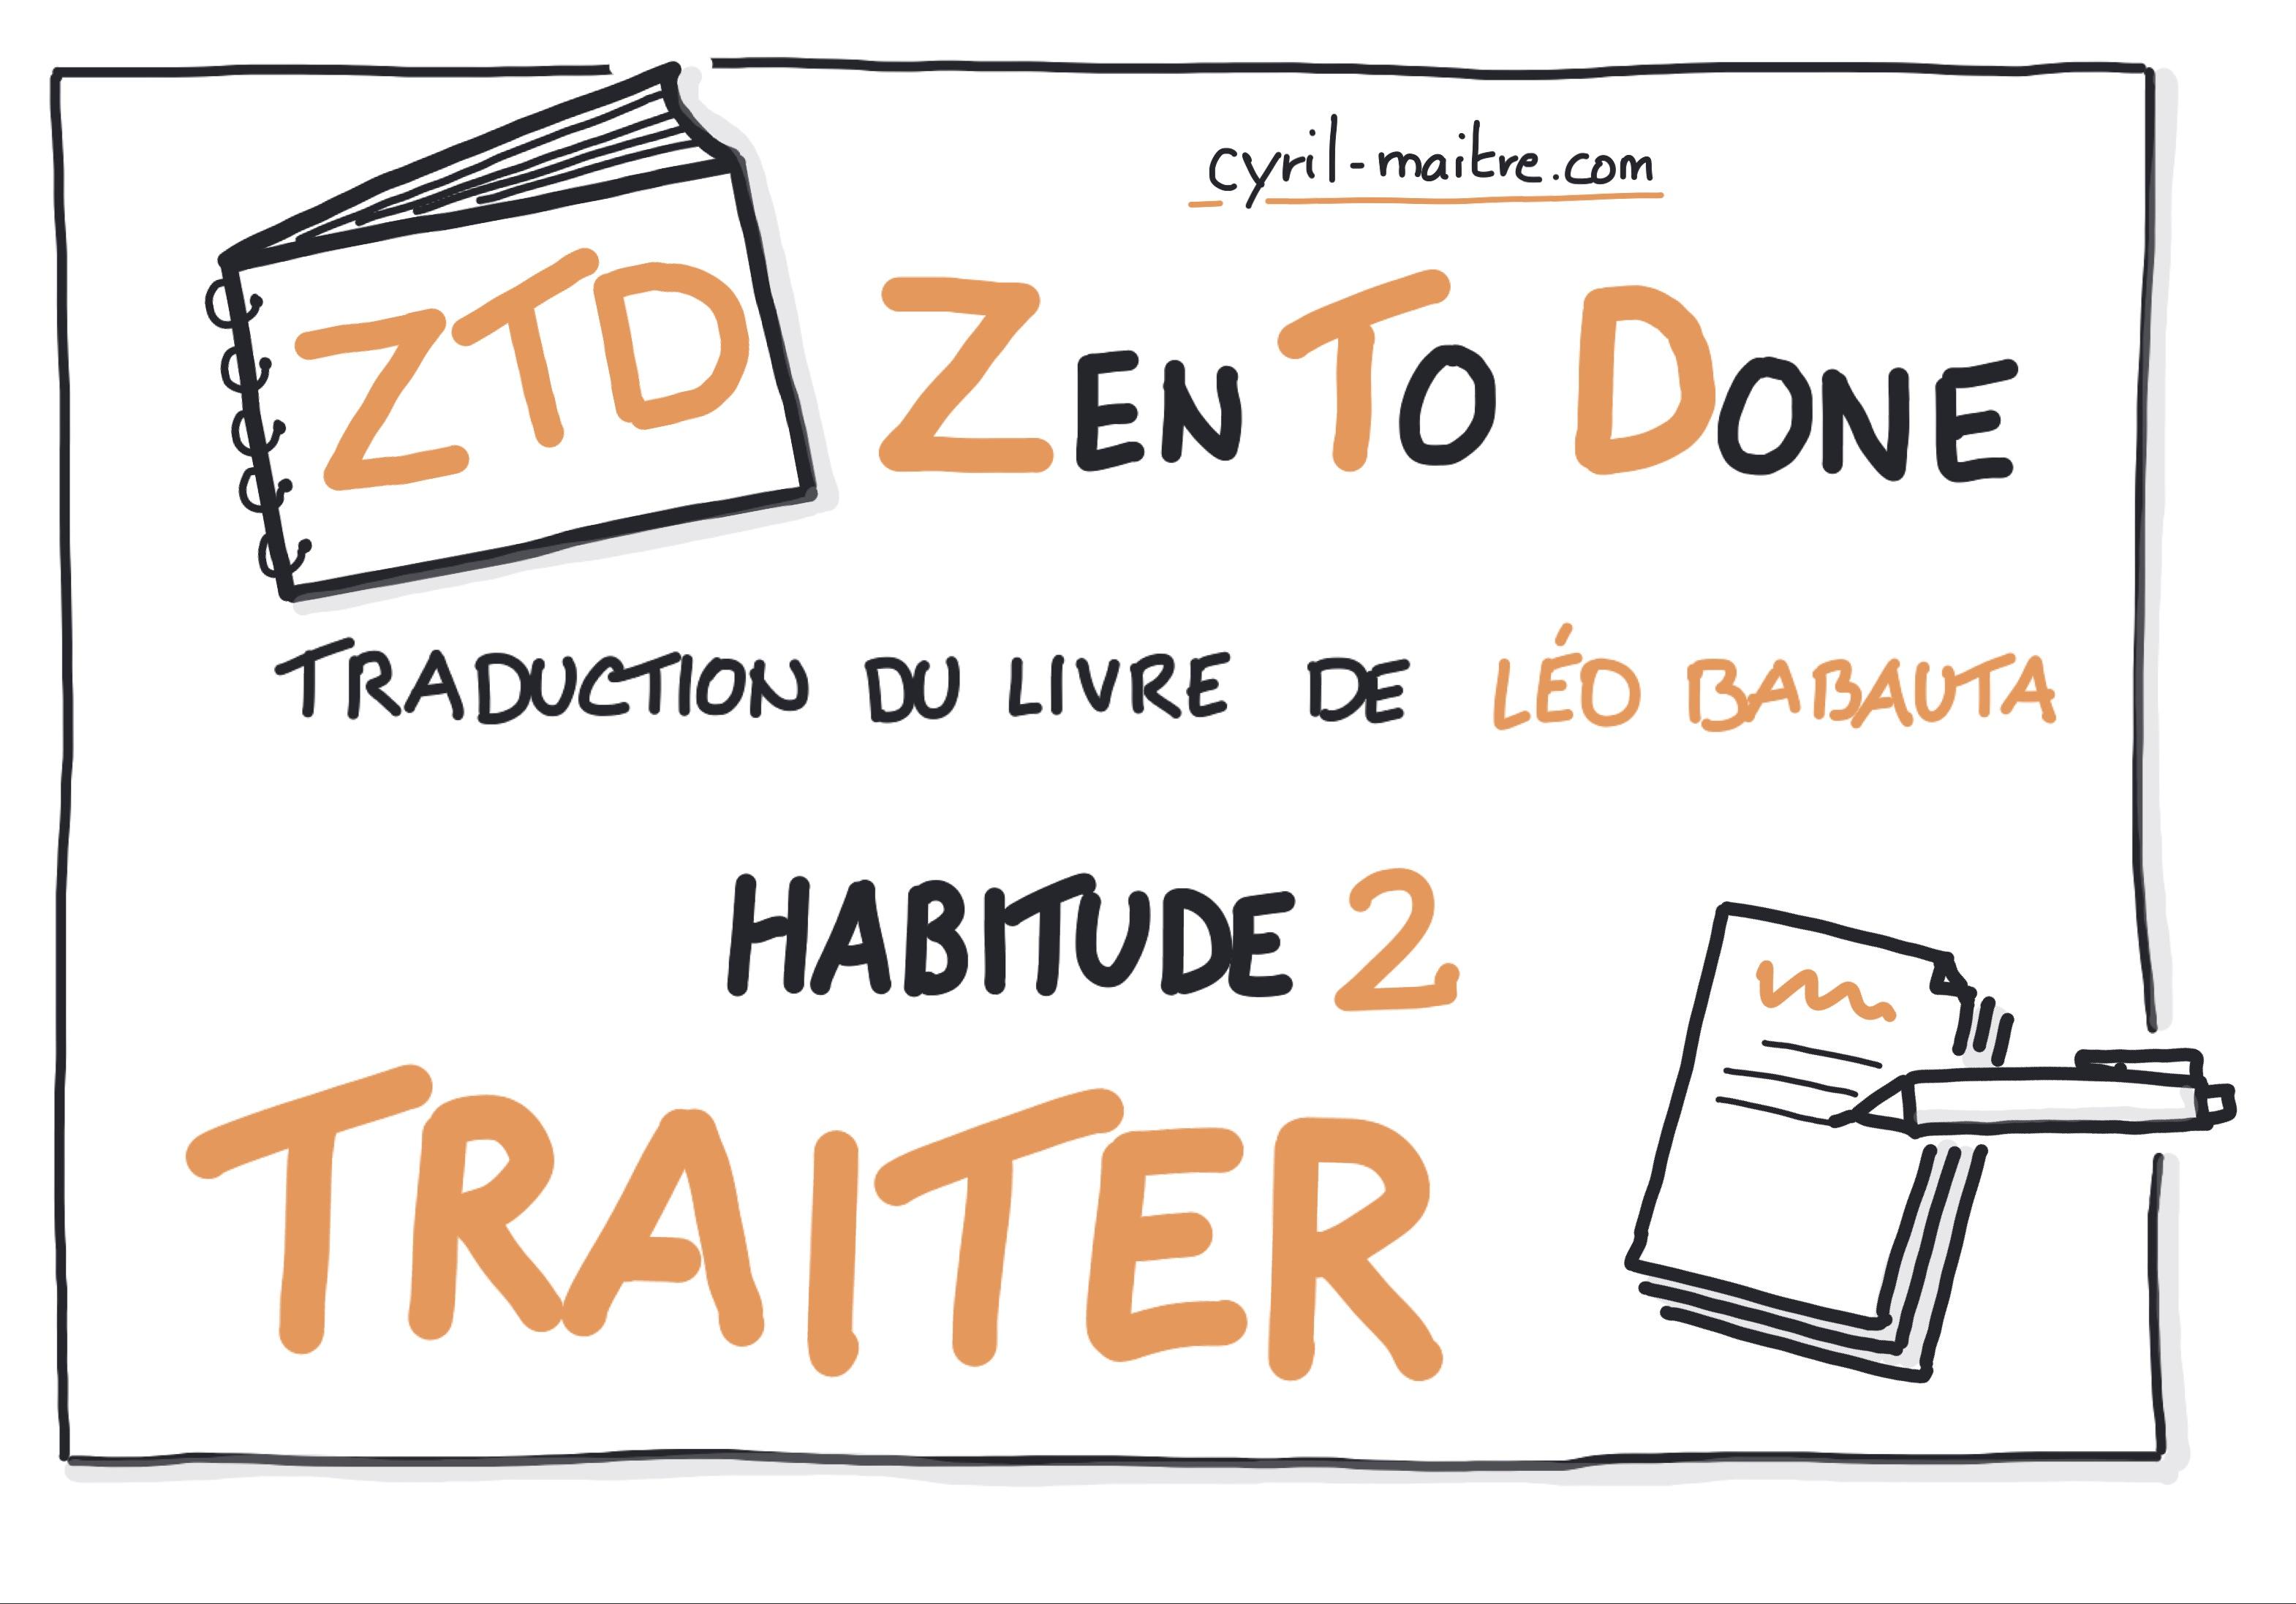 Zen To Done - habitude 2 : Traiter